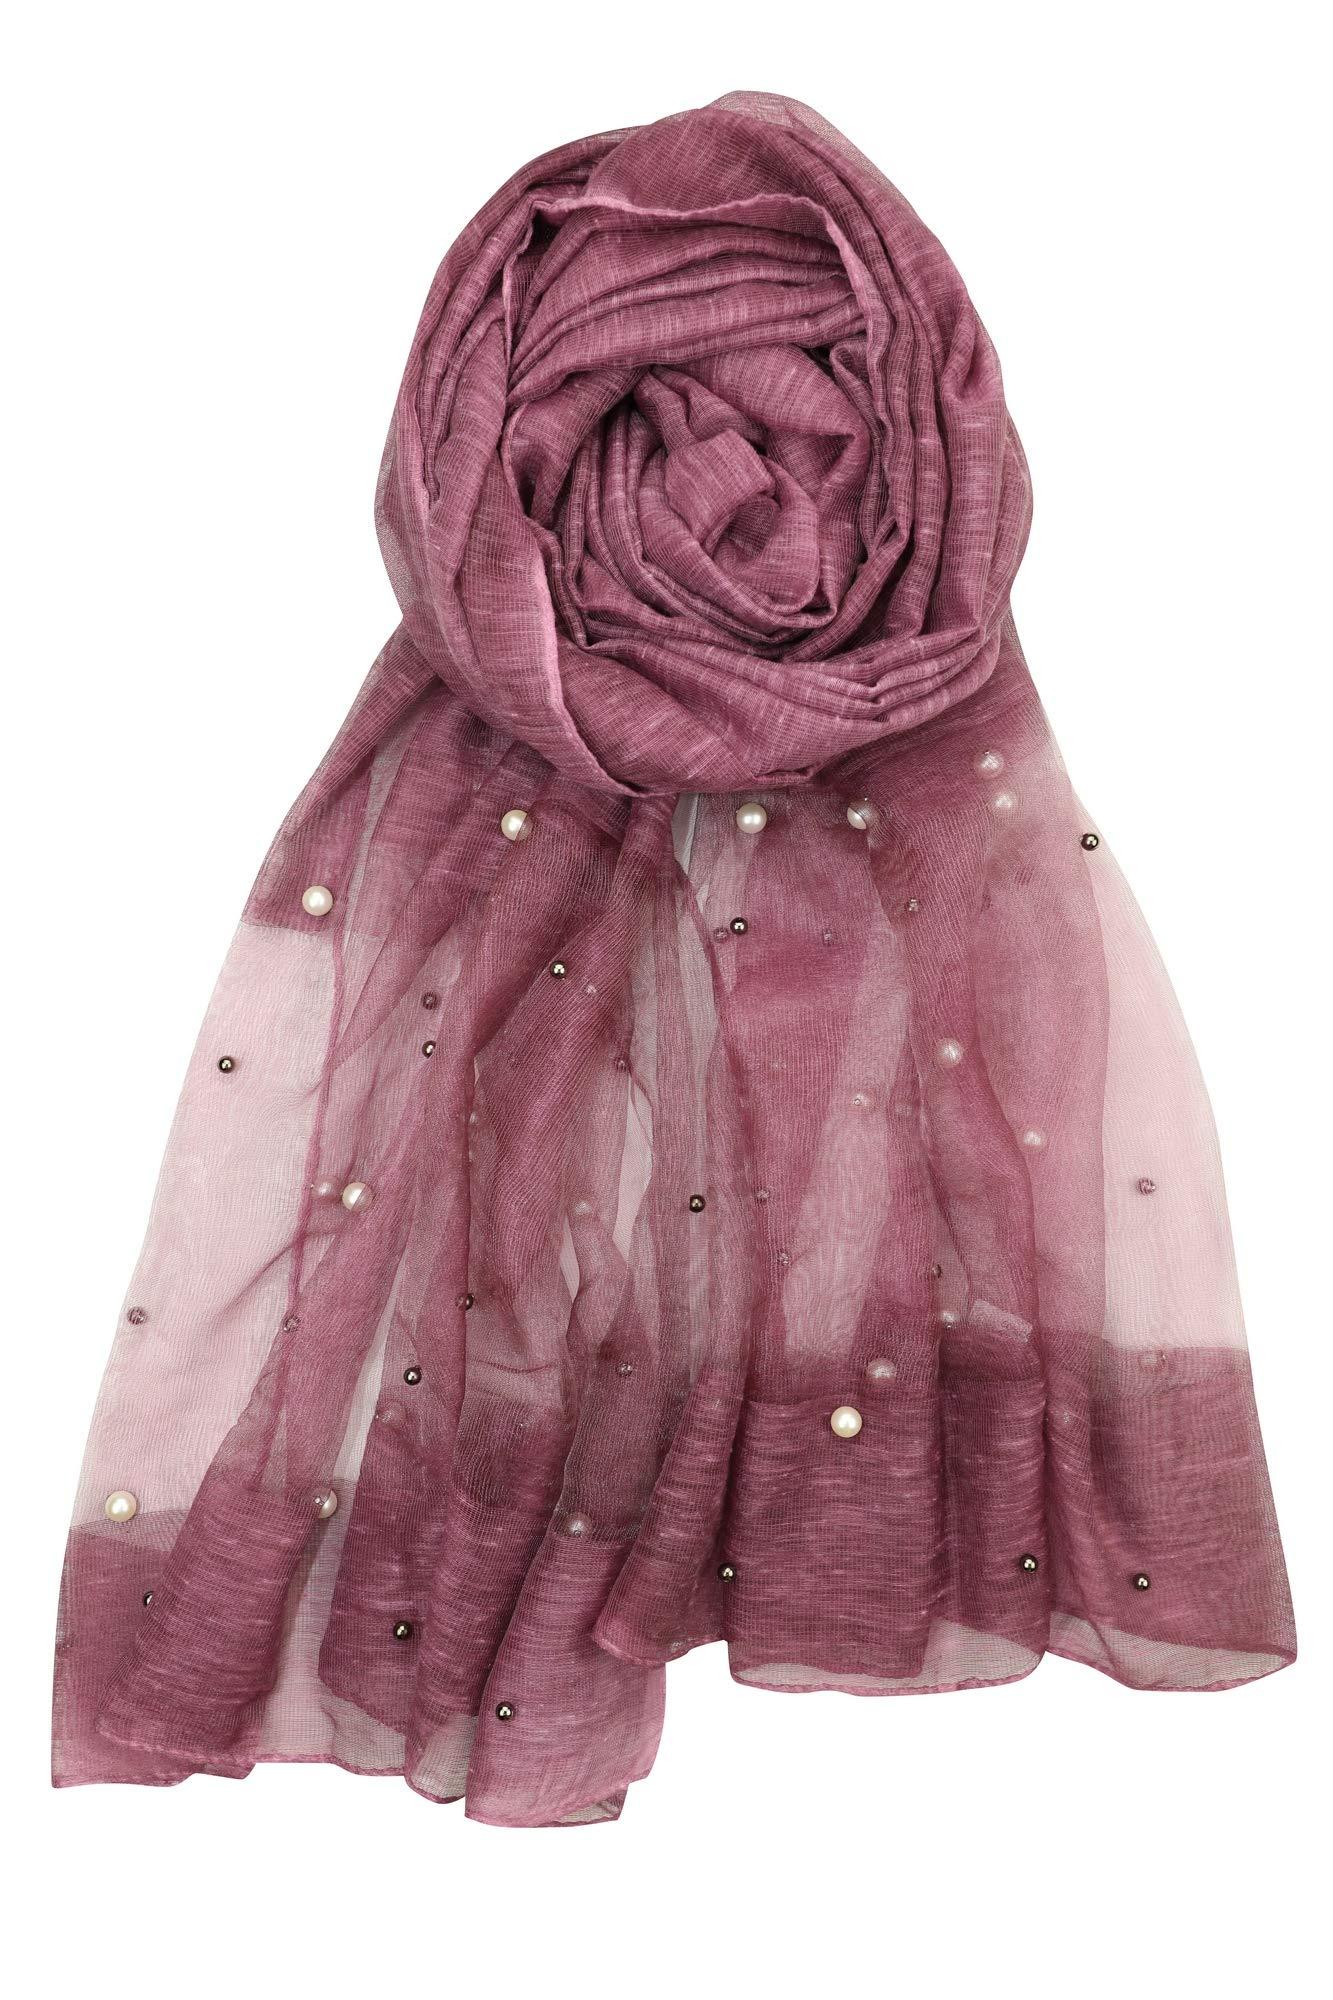 Achillea Women's Elegant Pearl Beaded Embellished Sheer Scarf Shawl Wrap (Plum)